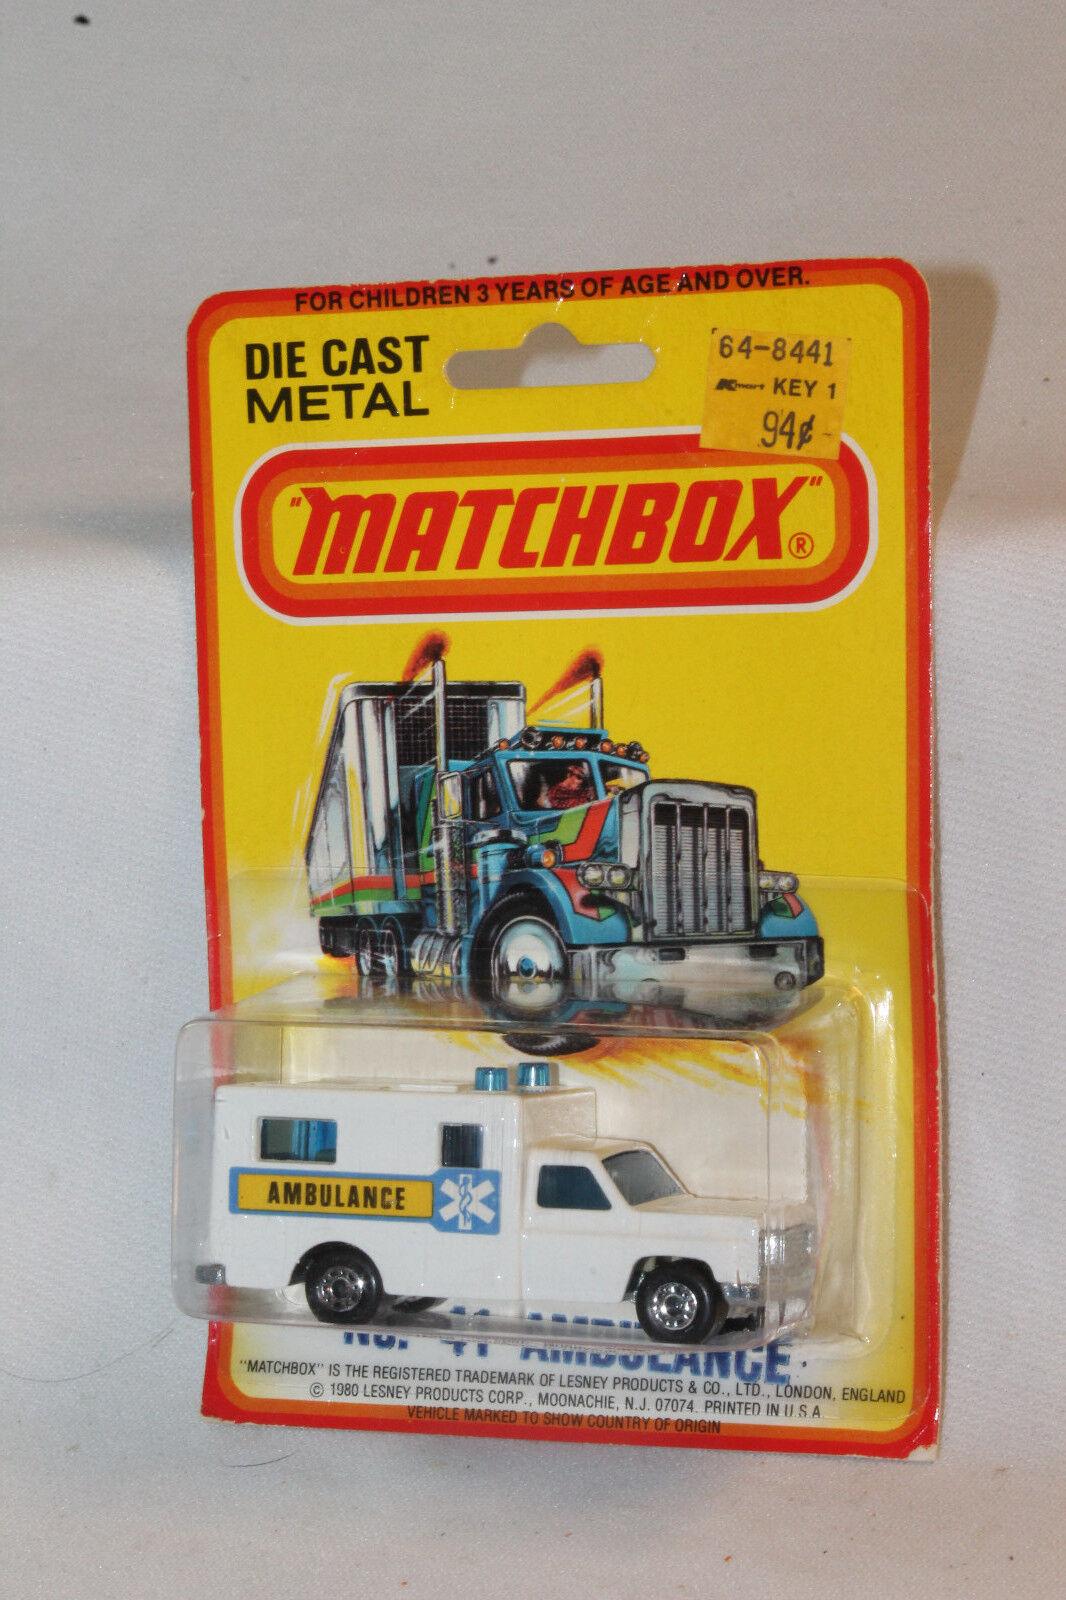 Matchbox Superfast   41 Ambulancia, blancoo Con Con Con Azul Cruz Etiquetas, Moc 69d1f2